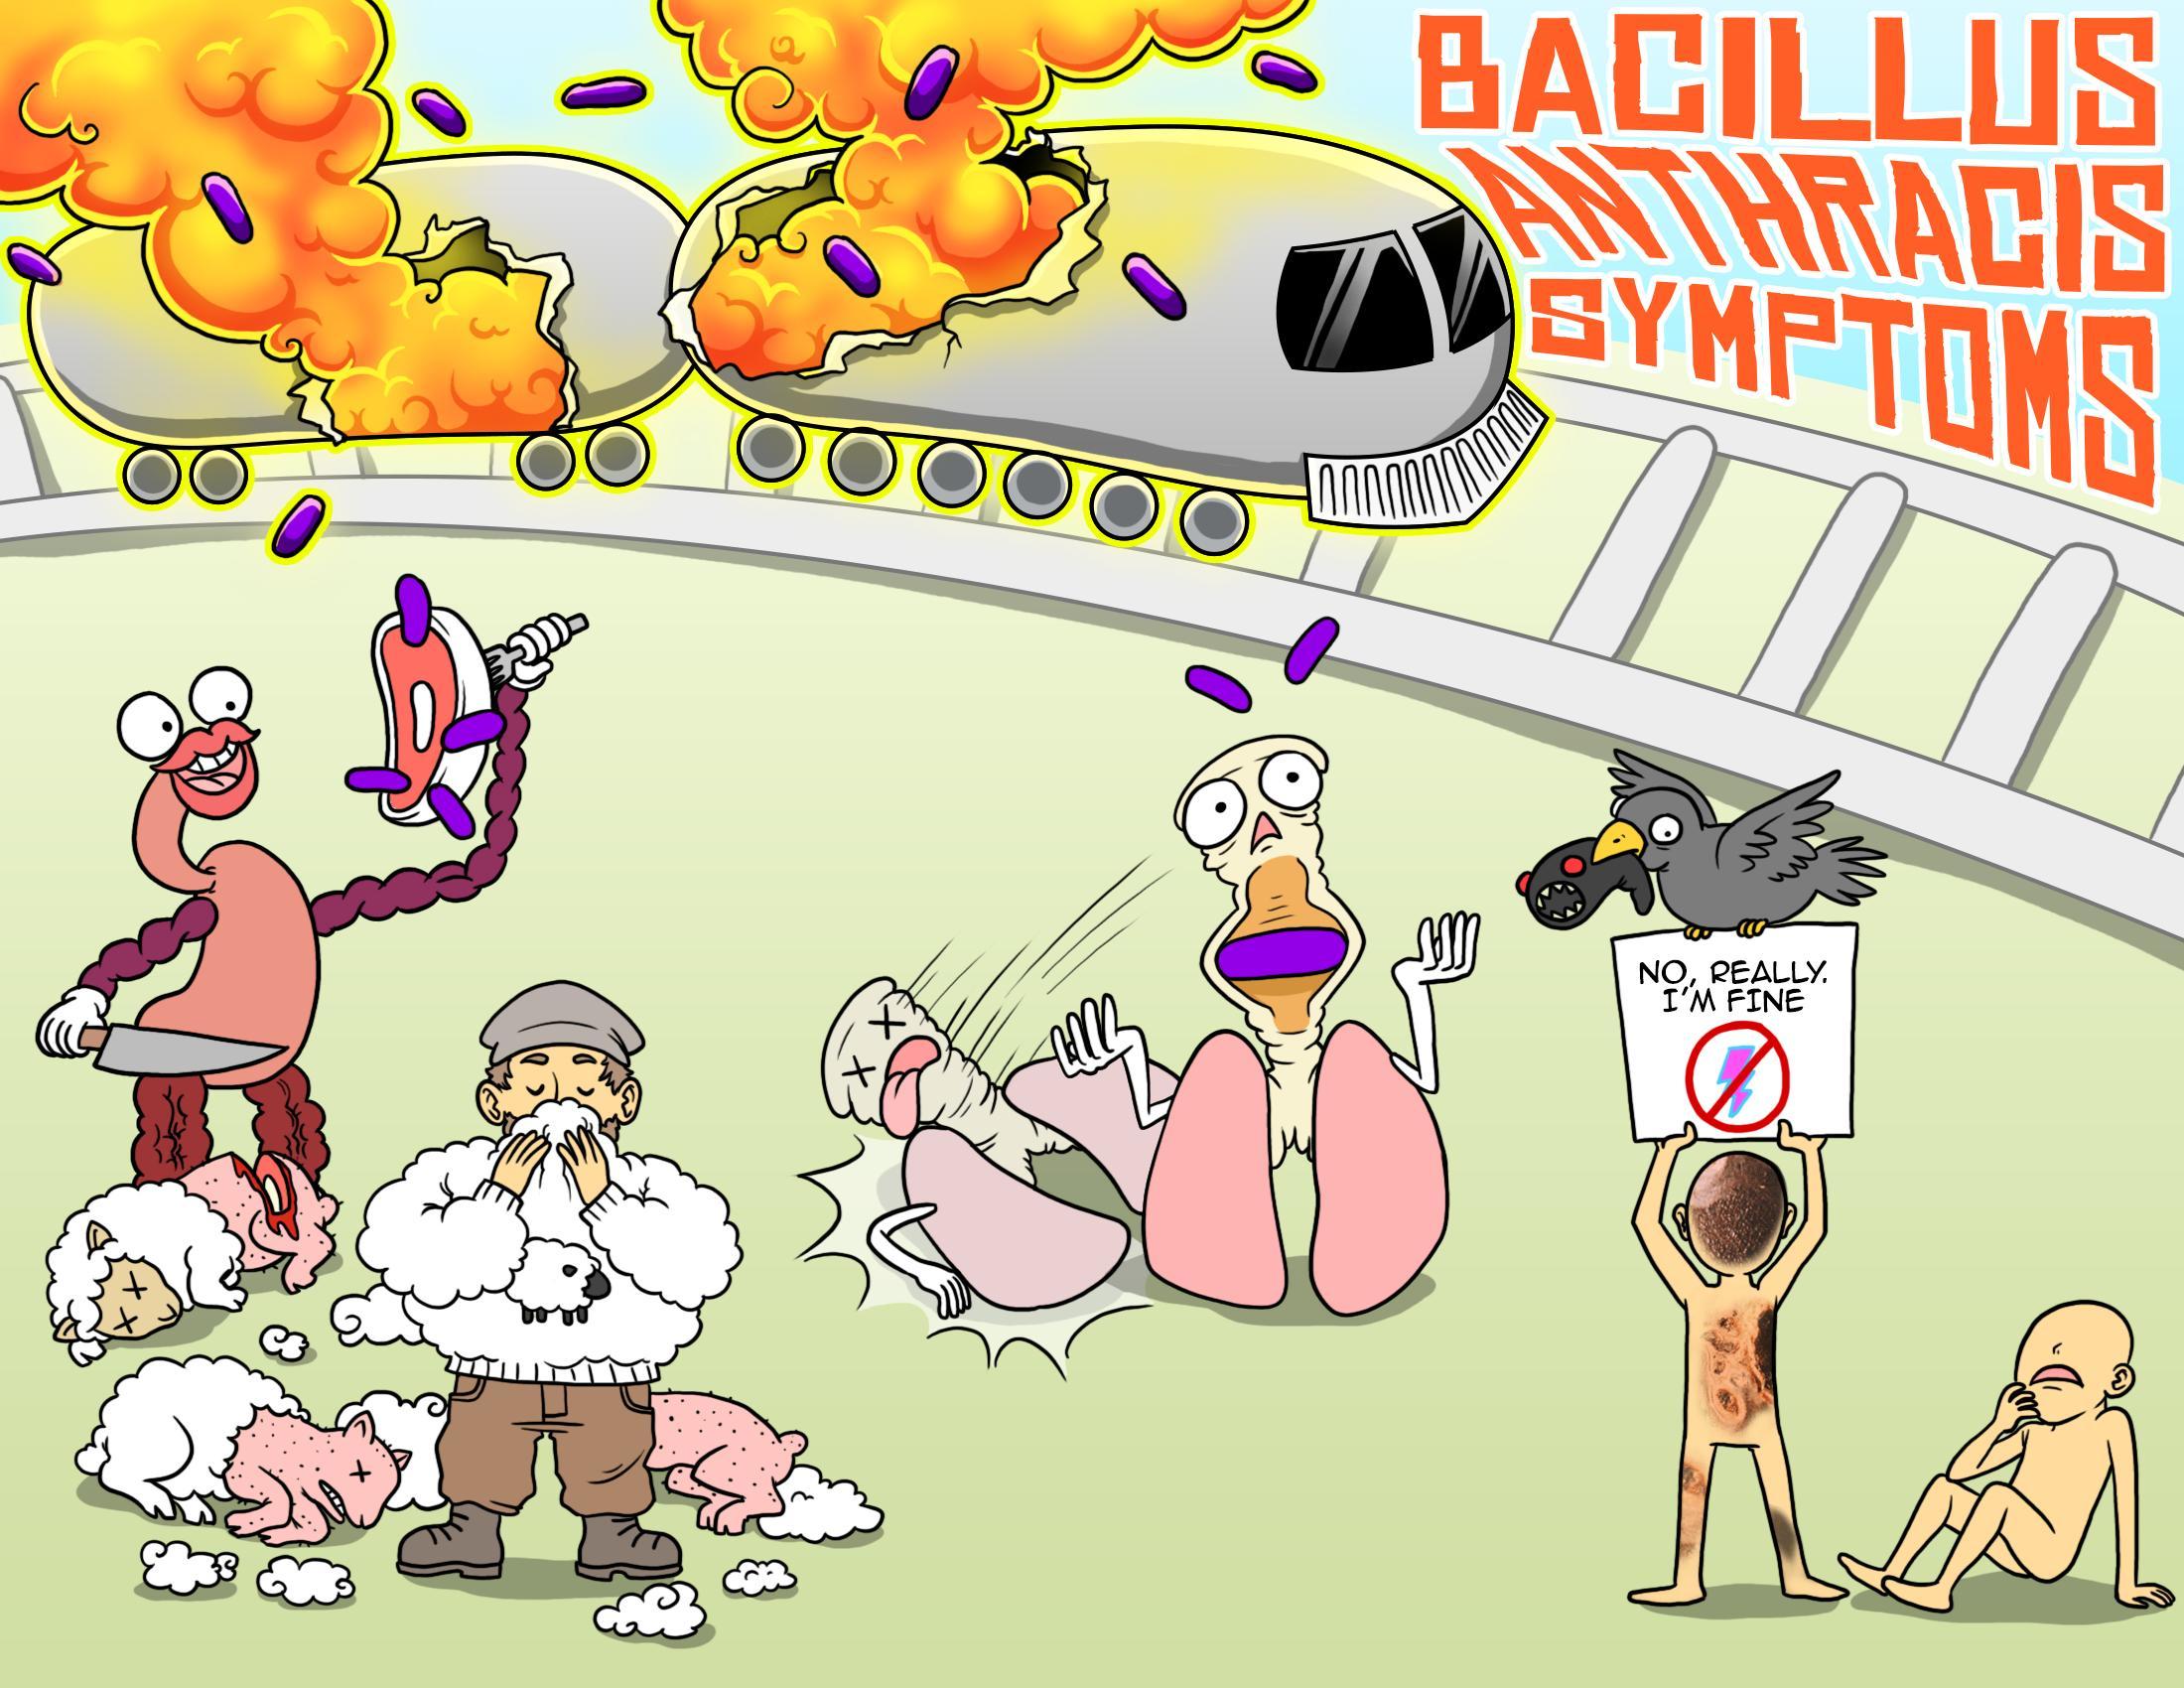 Bacillus Anthracis (Anthrax) Disease